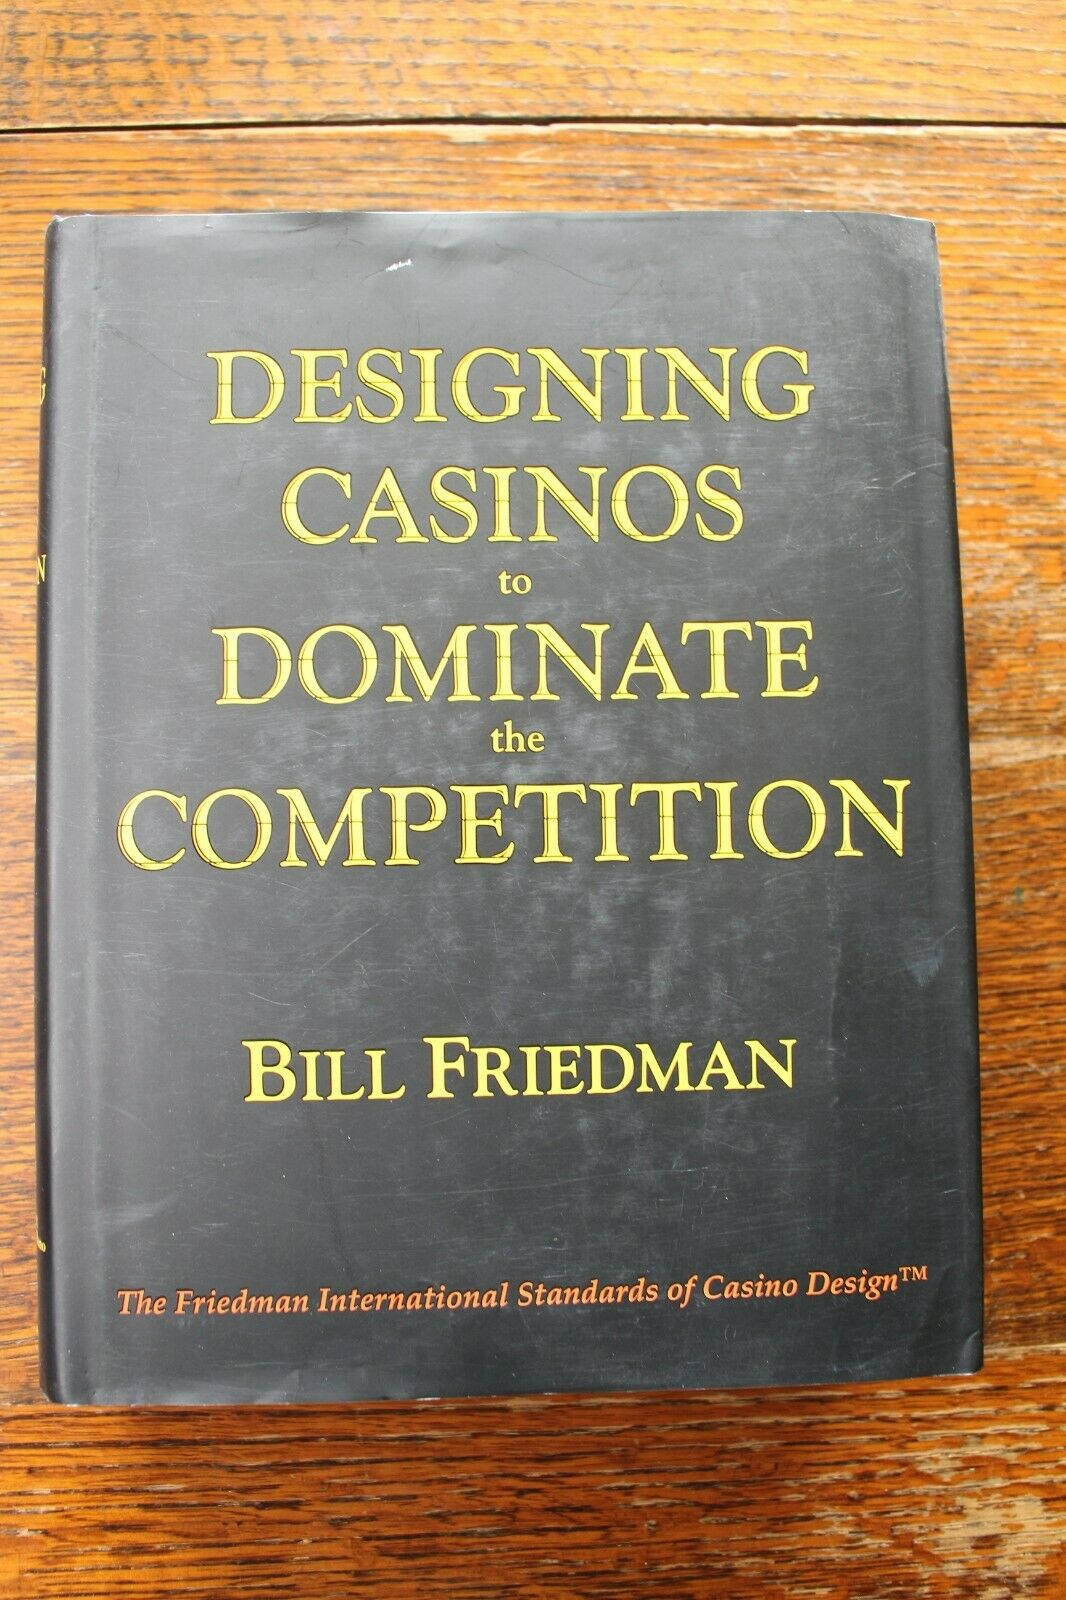 Casino casino competition design designing dominate friedman international standard game dog and cat 2